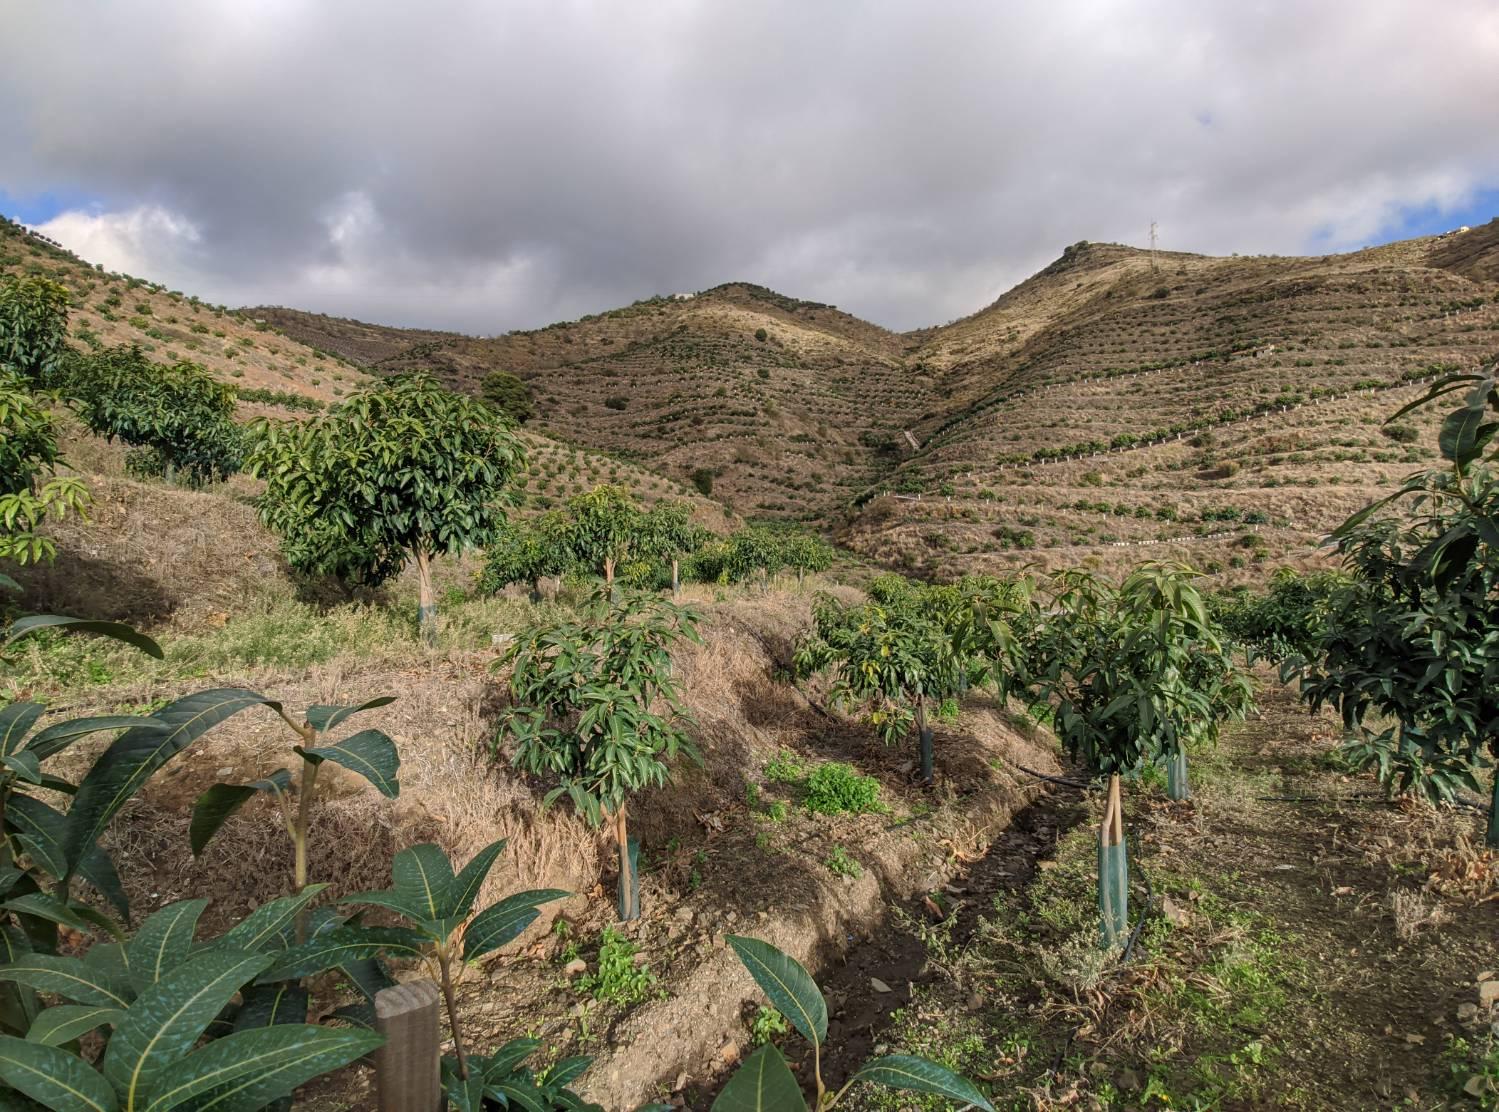 imagen 1 de Finca de mangos en Almuñécar (Finca de Banco)